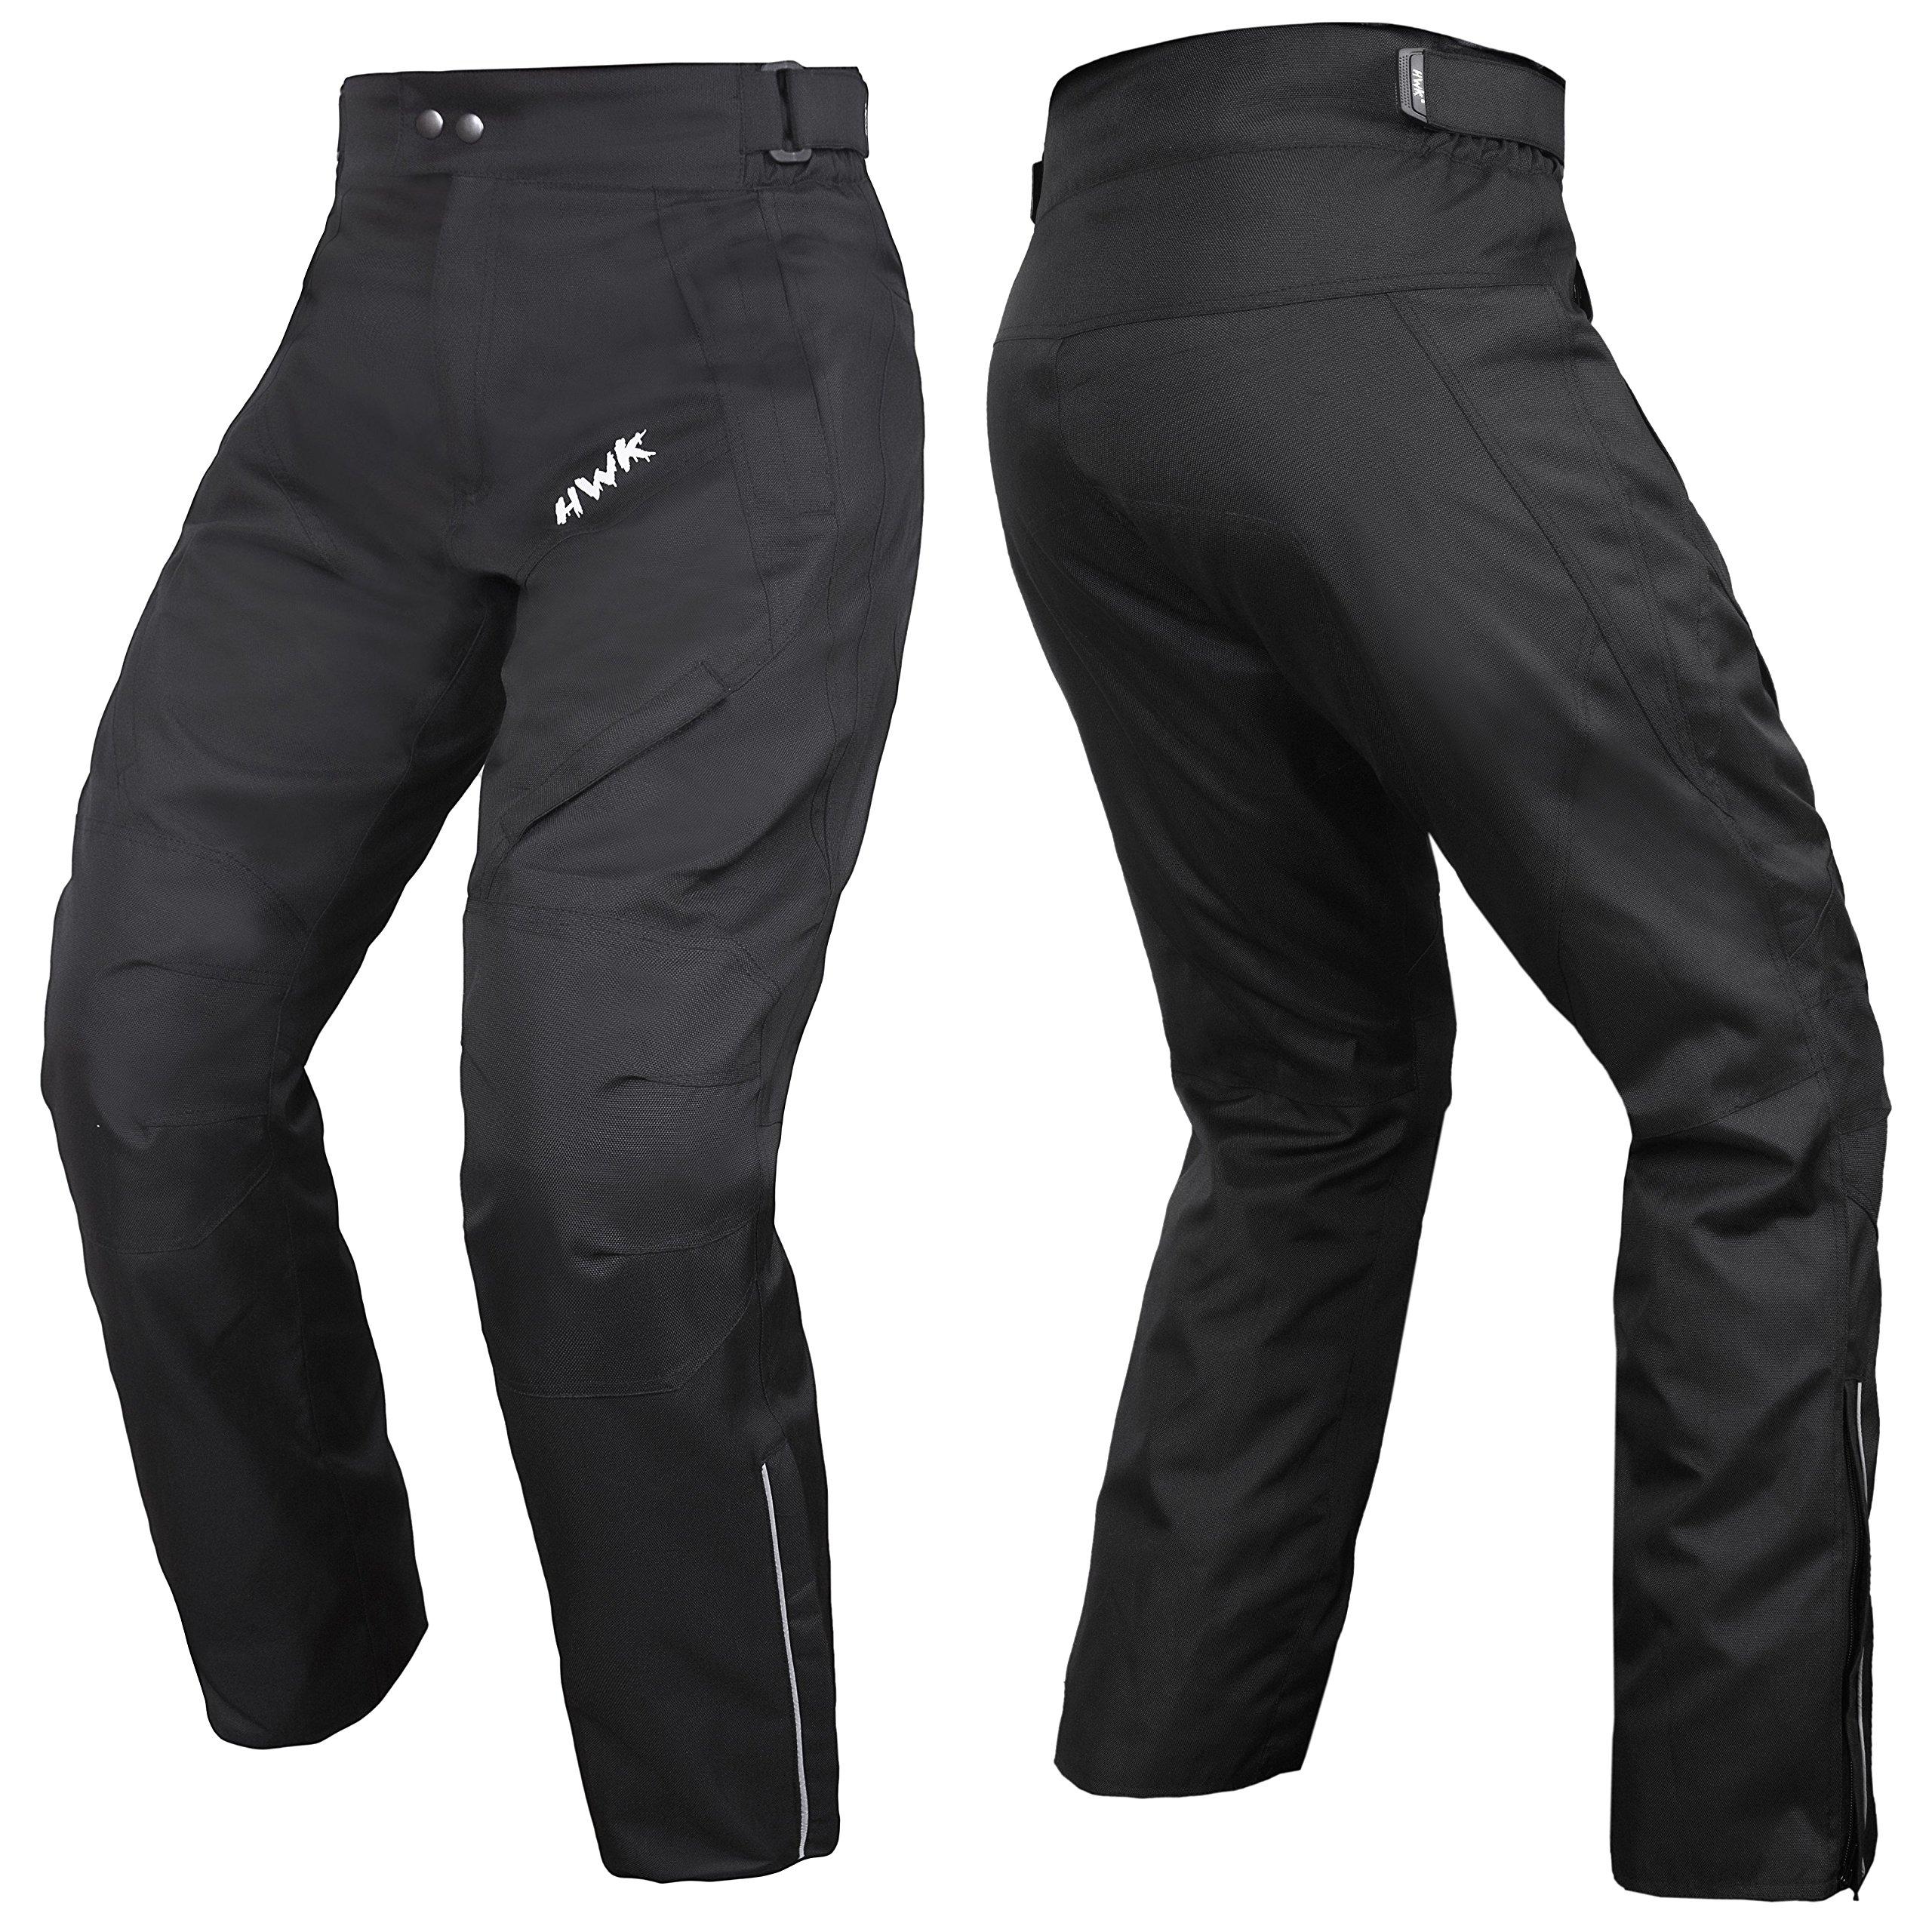 HWK Mens Black Textile Breathable Waterproof CE Armoured Motorbike Overpants Motorcycle Trousers/Pants - 1 year Guarantee Waist38''-40'' Inseam30'' by HHR